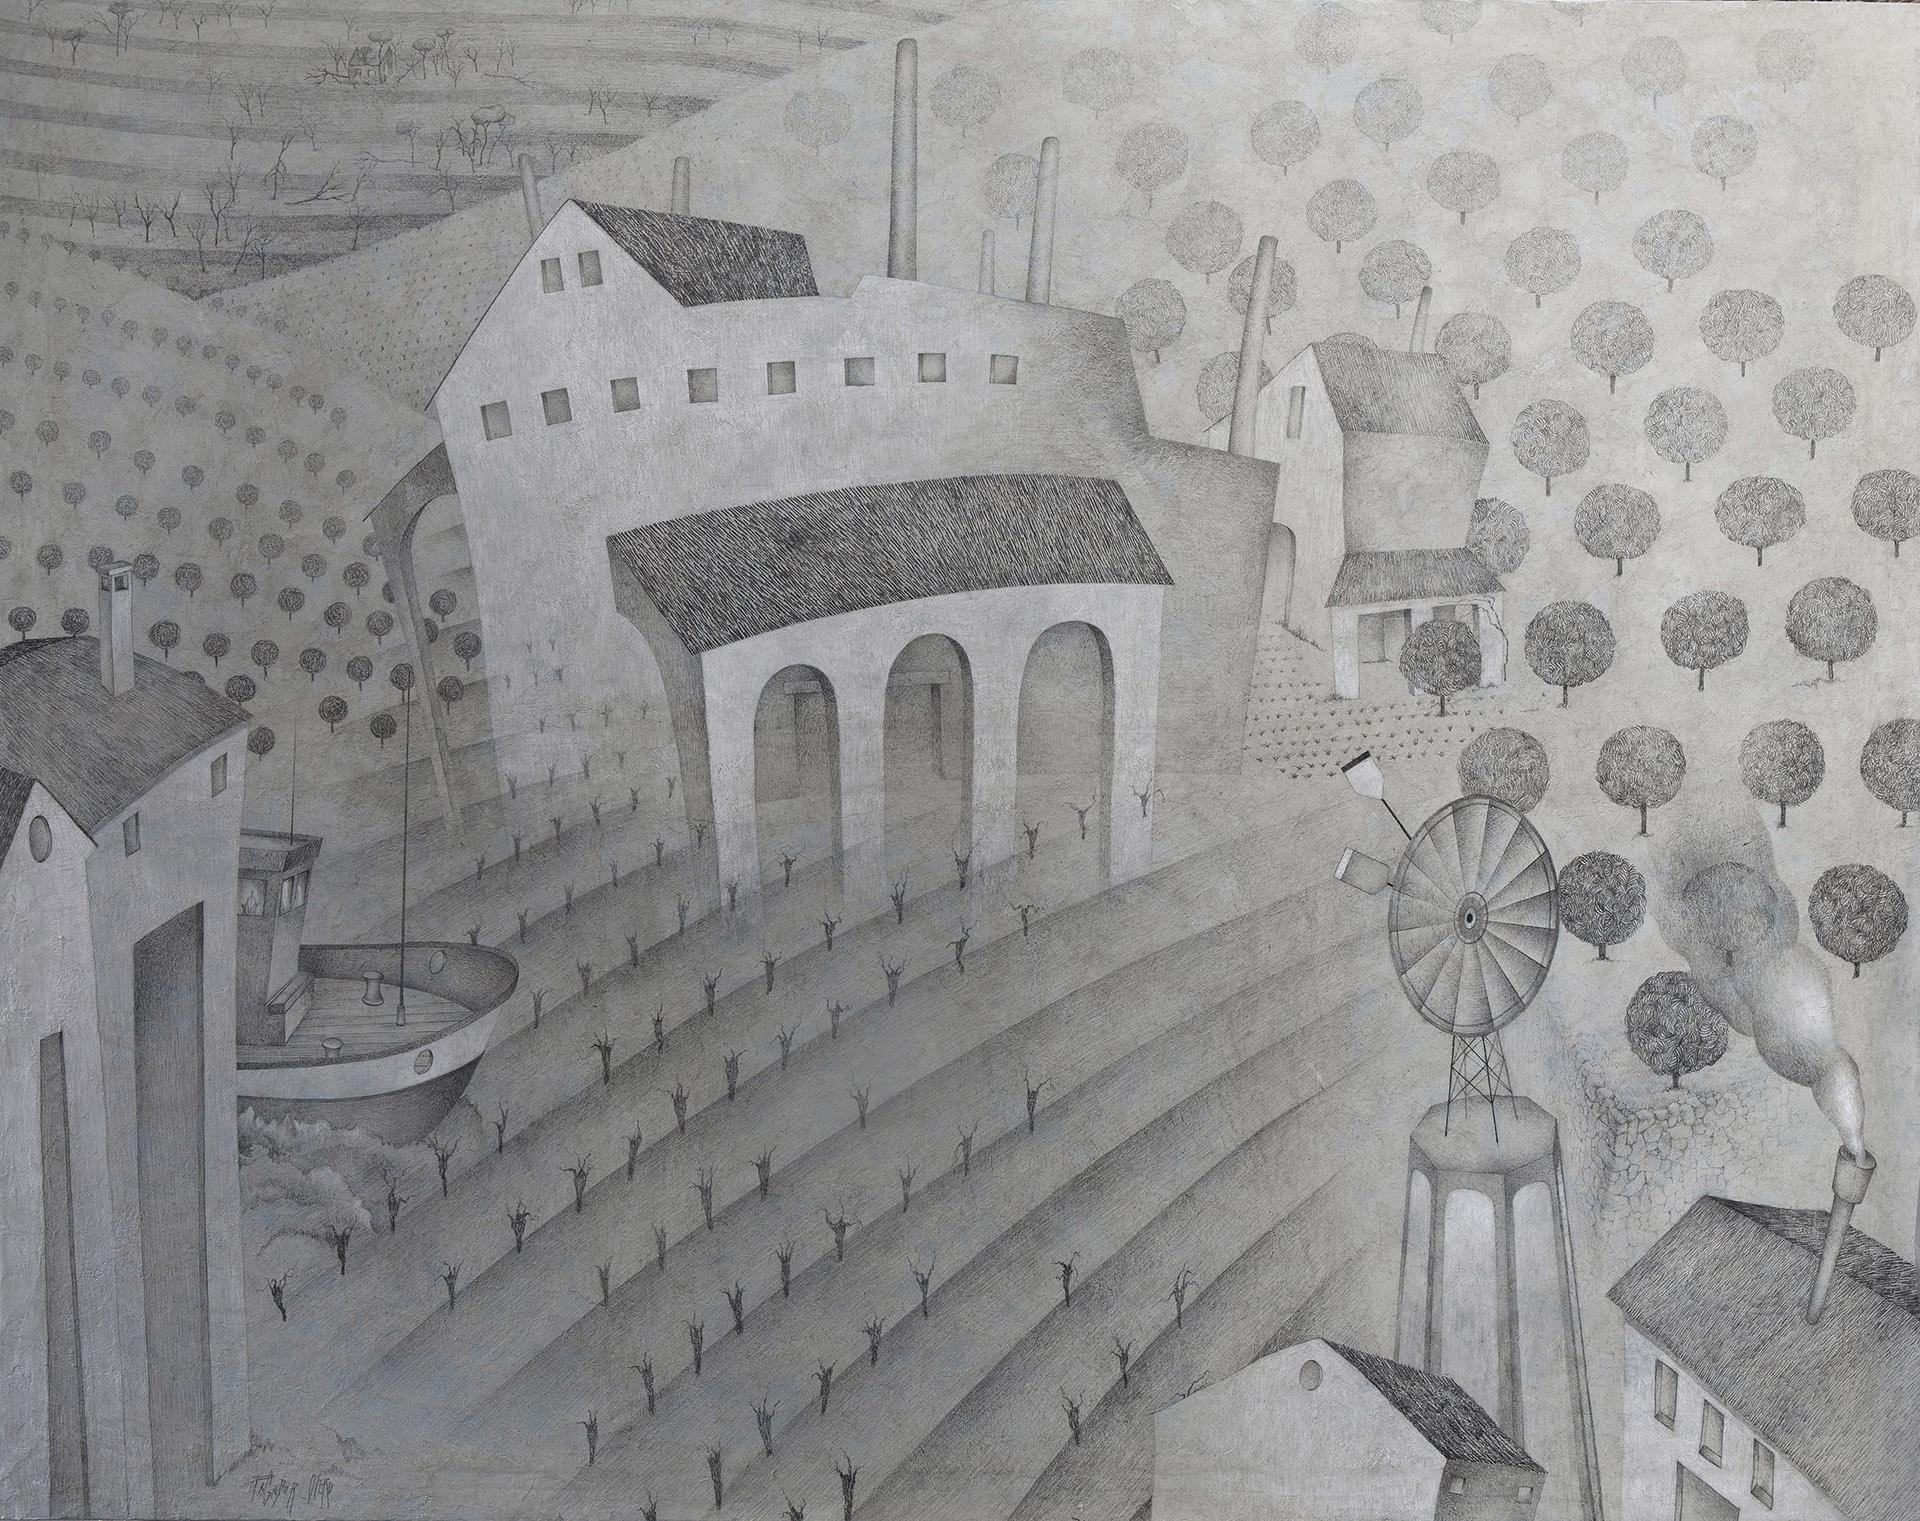 """MARINA ALTA IV""  Grafito y Tiza S/Lienzo  120x154 cm. 2019 Gata de Gorgos"